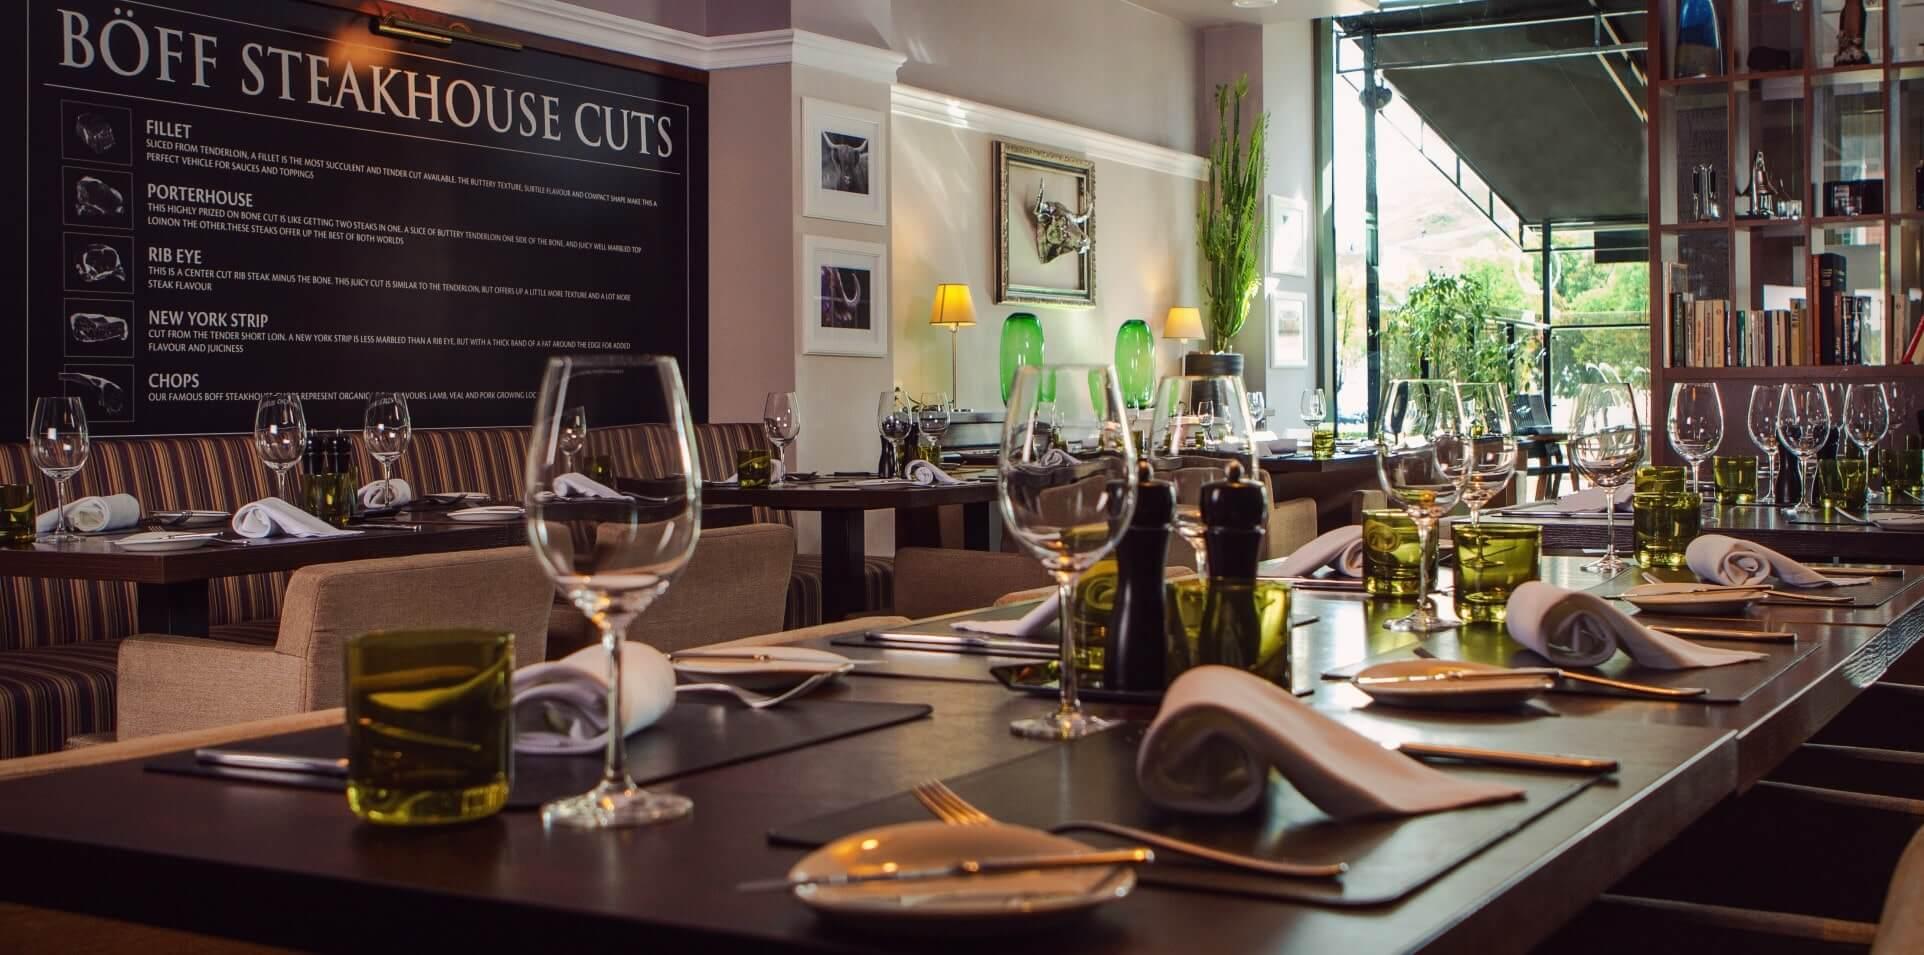 top 6 restaurants & top 4 steak houses in vilnius | where to eat?